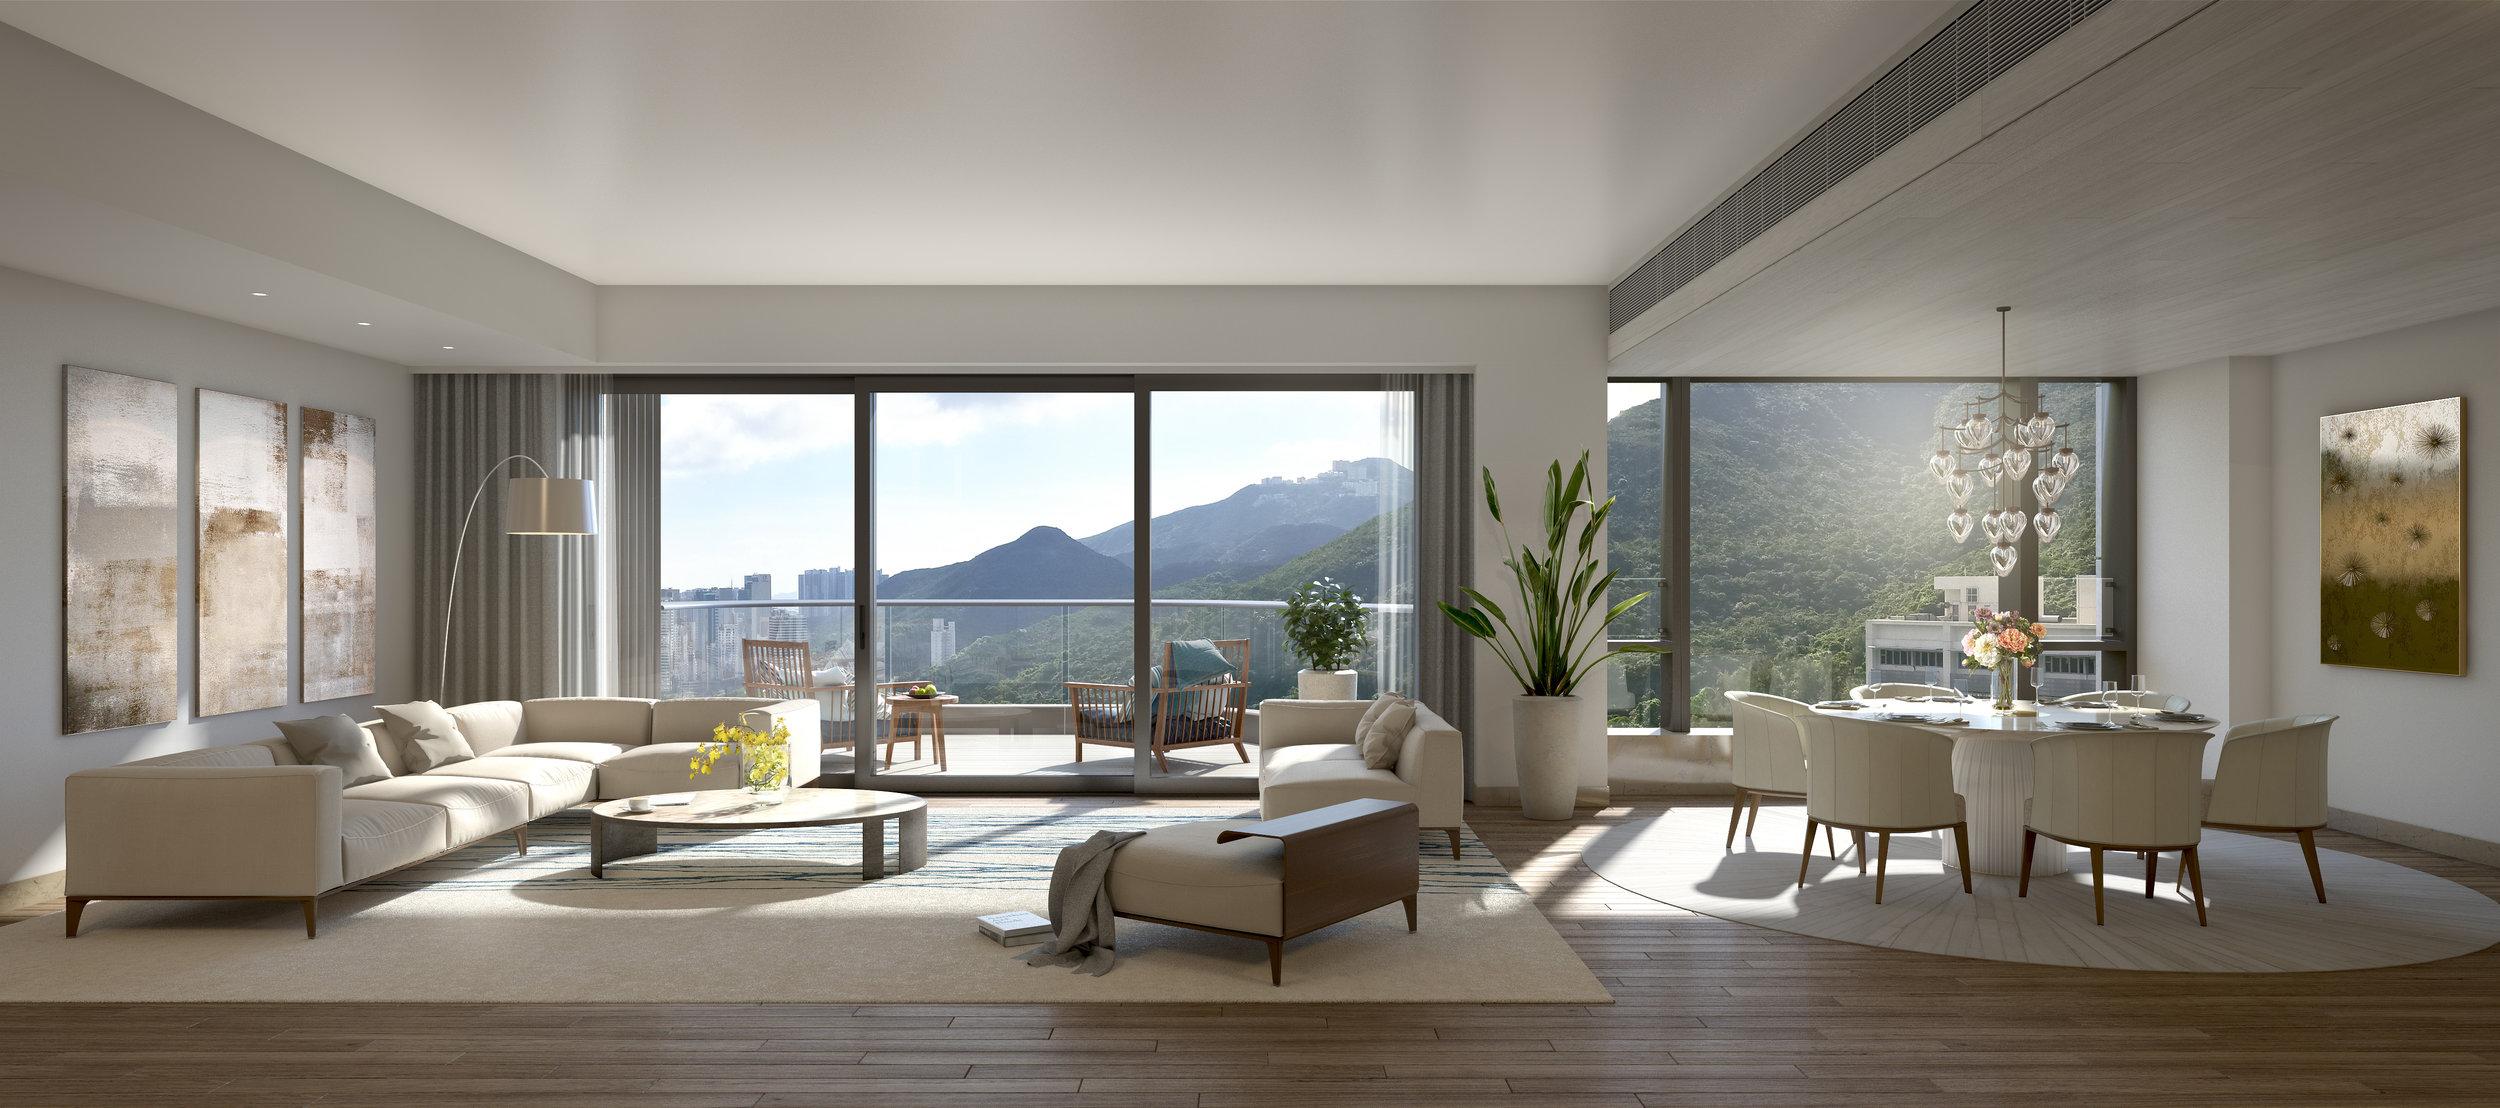 20170905_NanFung_Batch03_LivingBalcony_Panorama.jpg